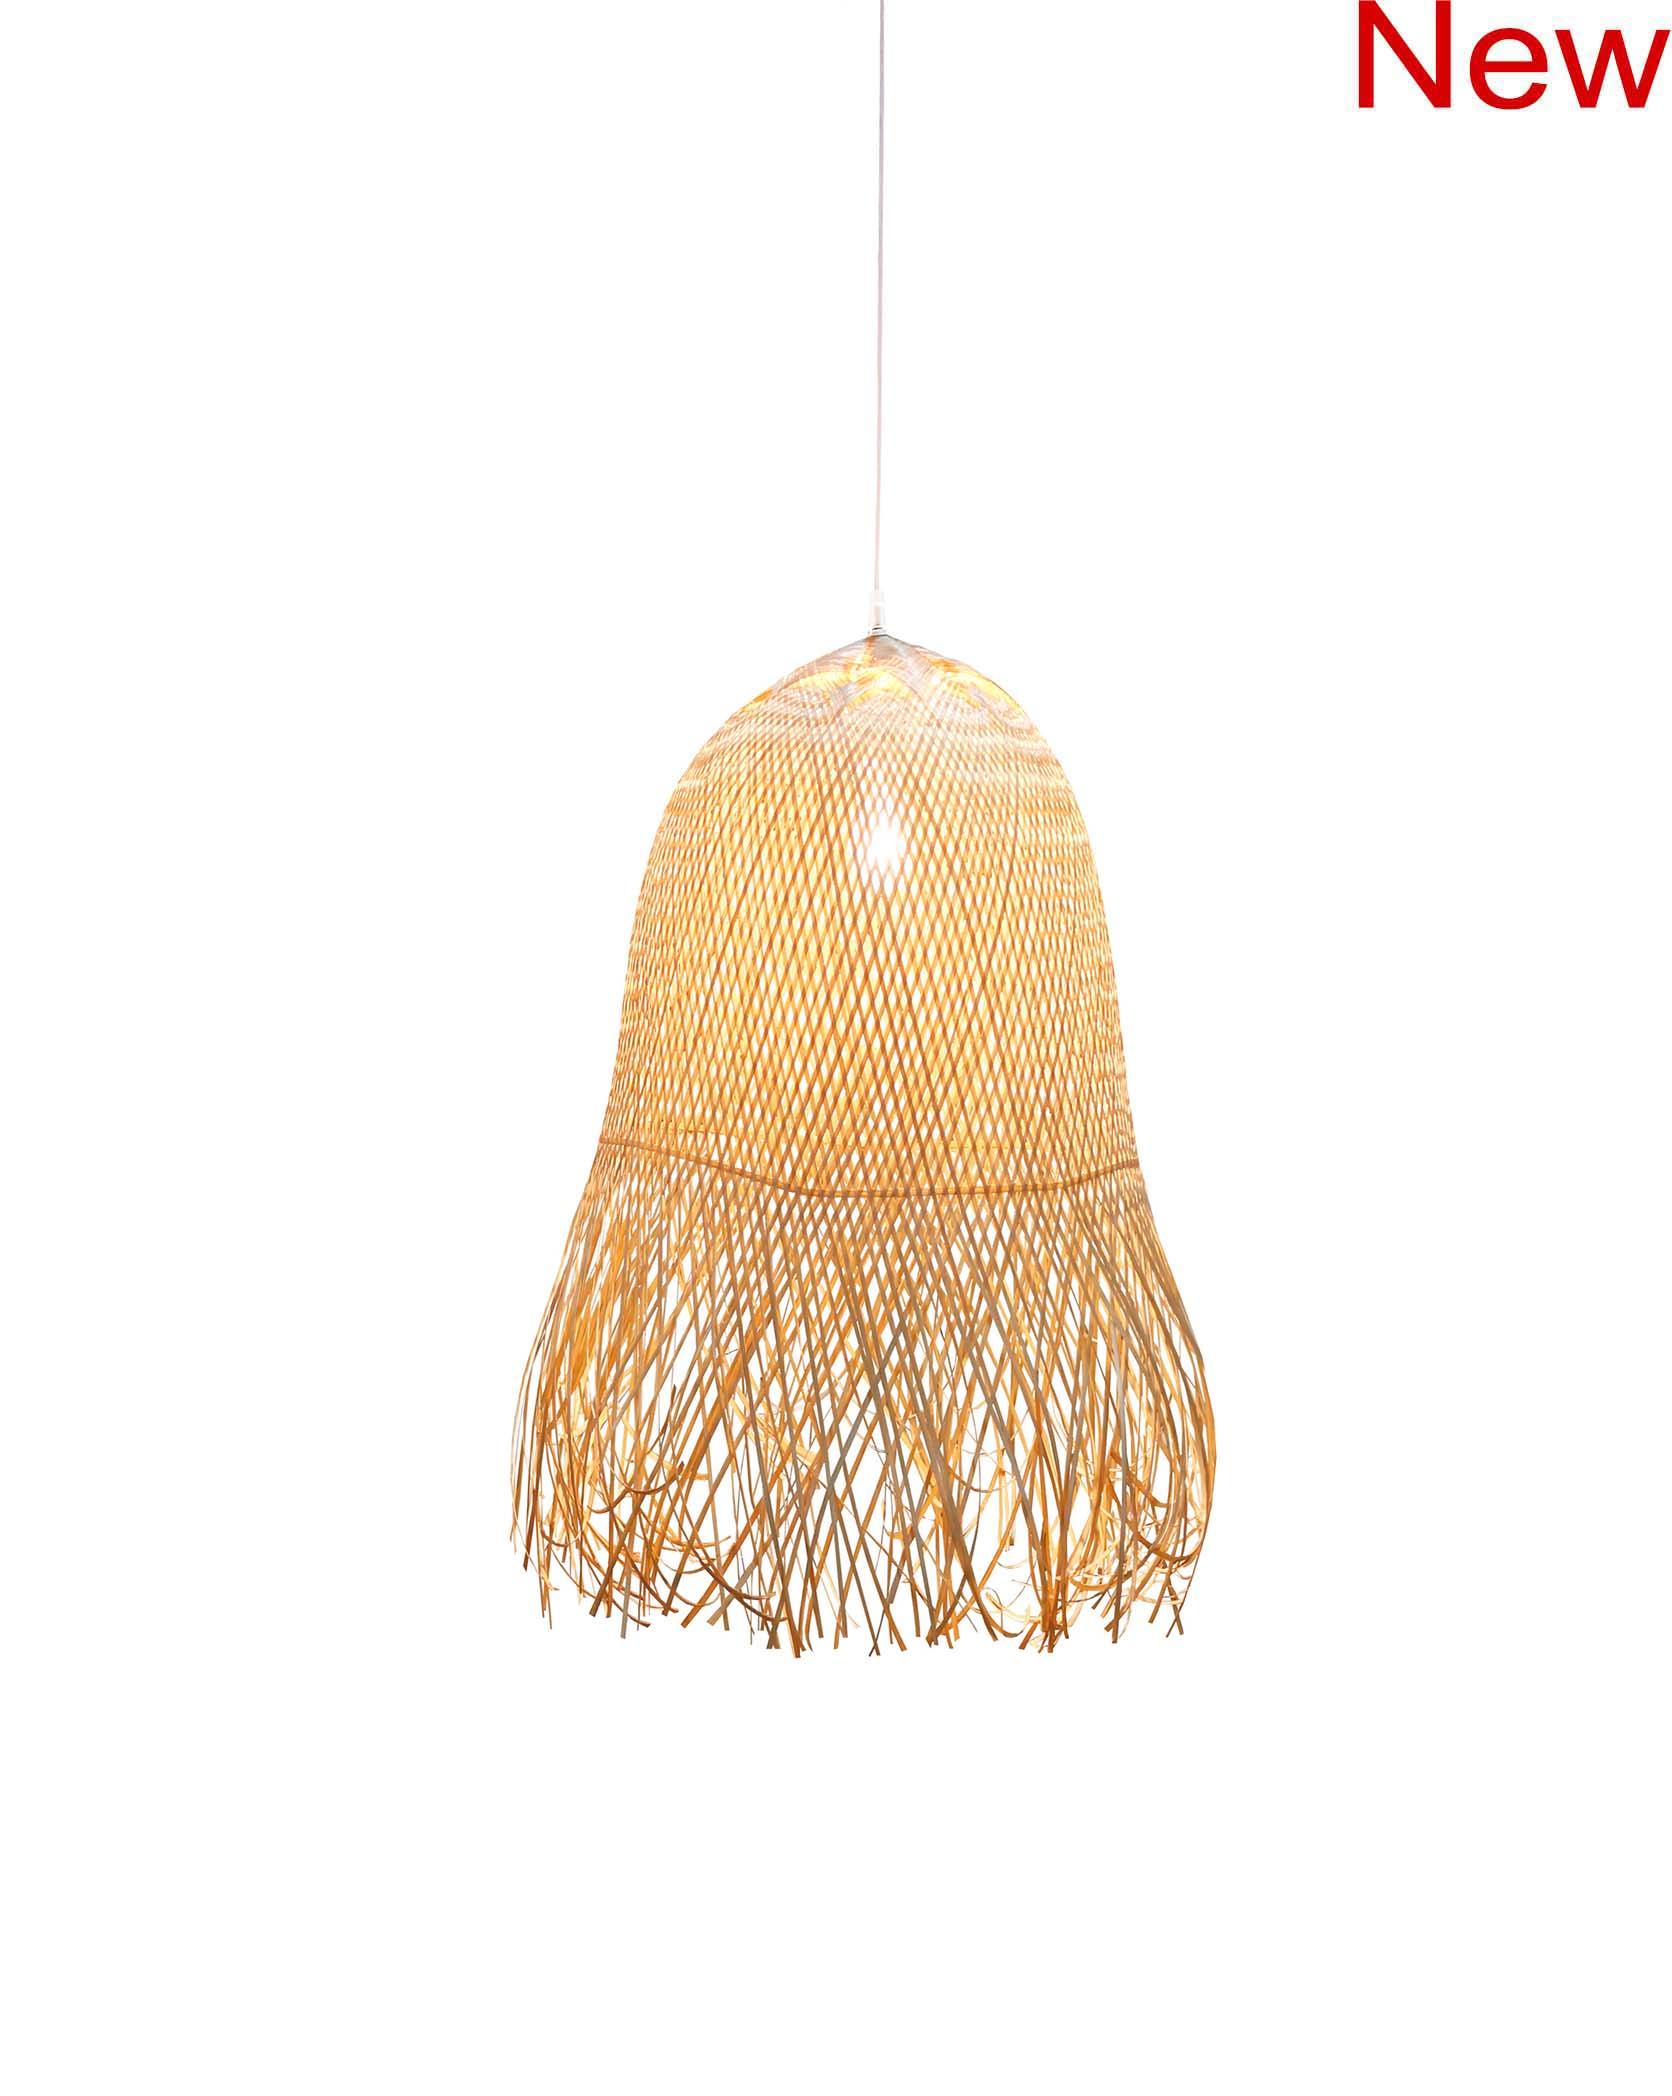 Bamboo Gem  pendant product photo #2